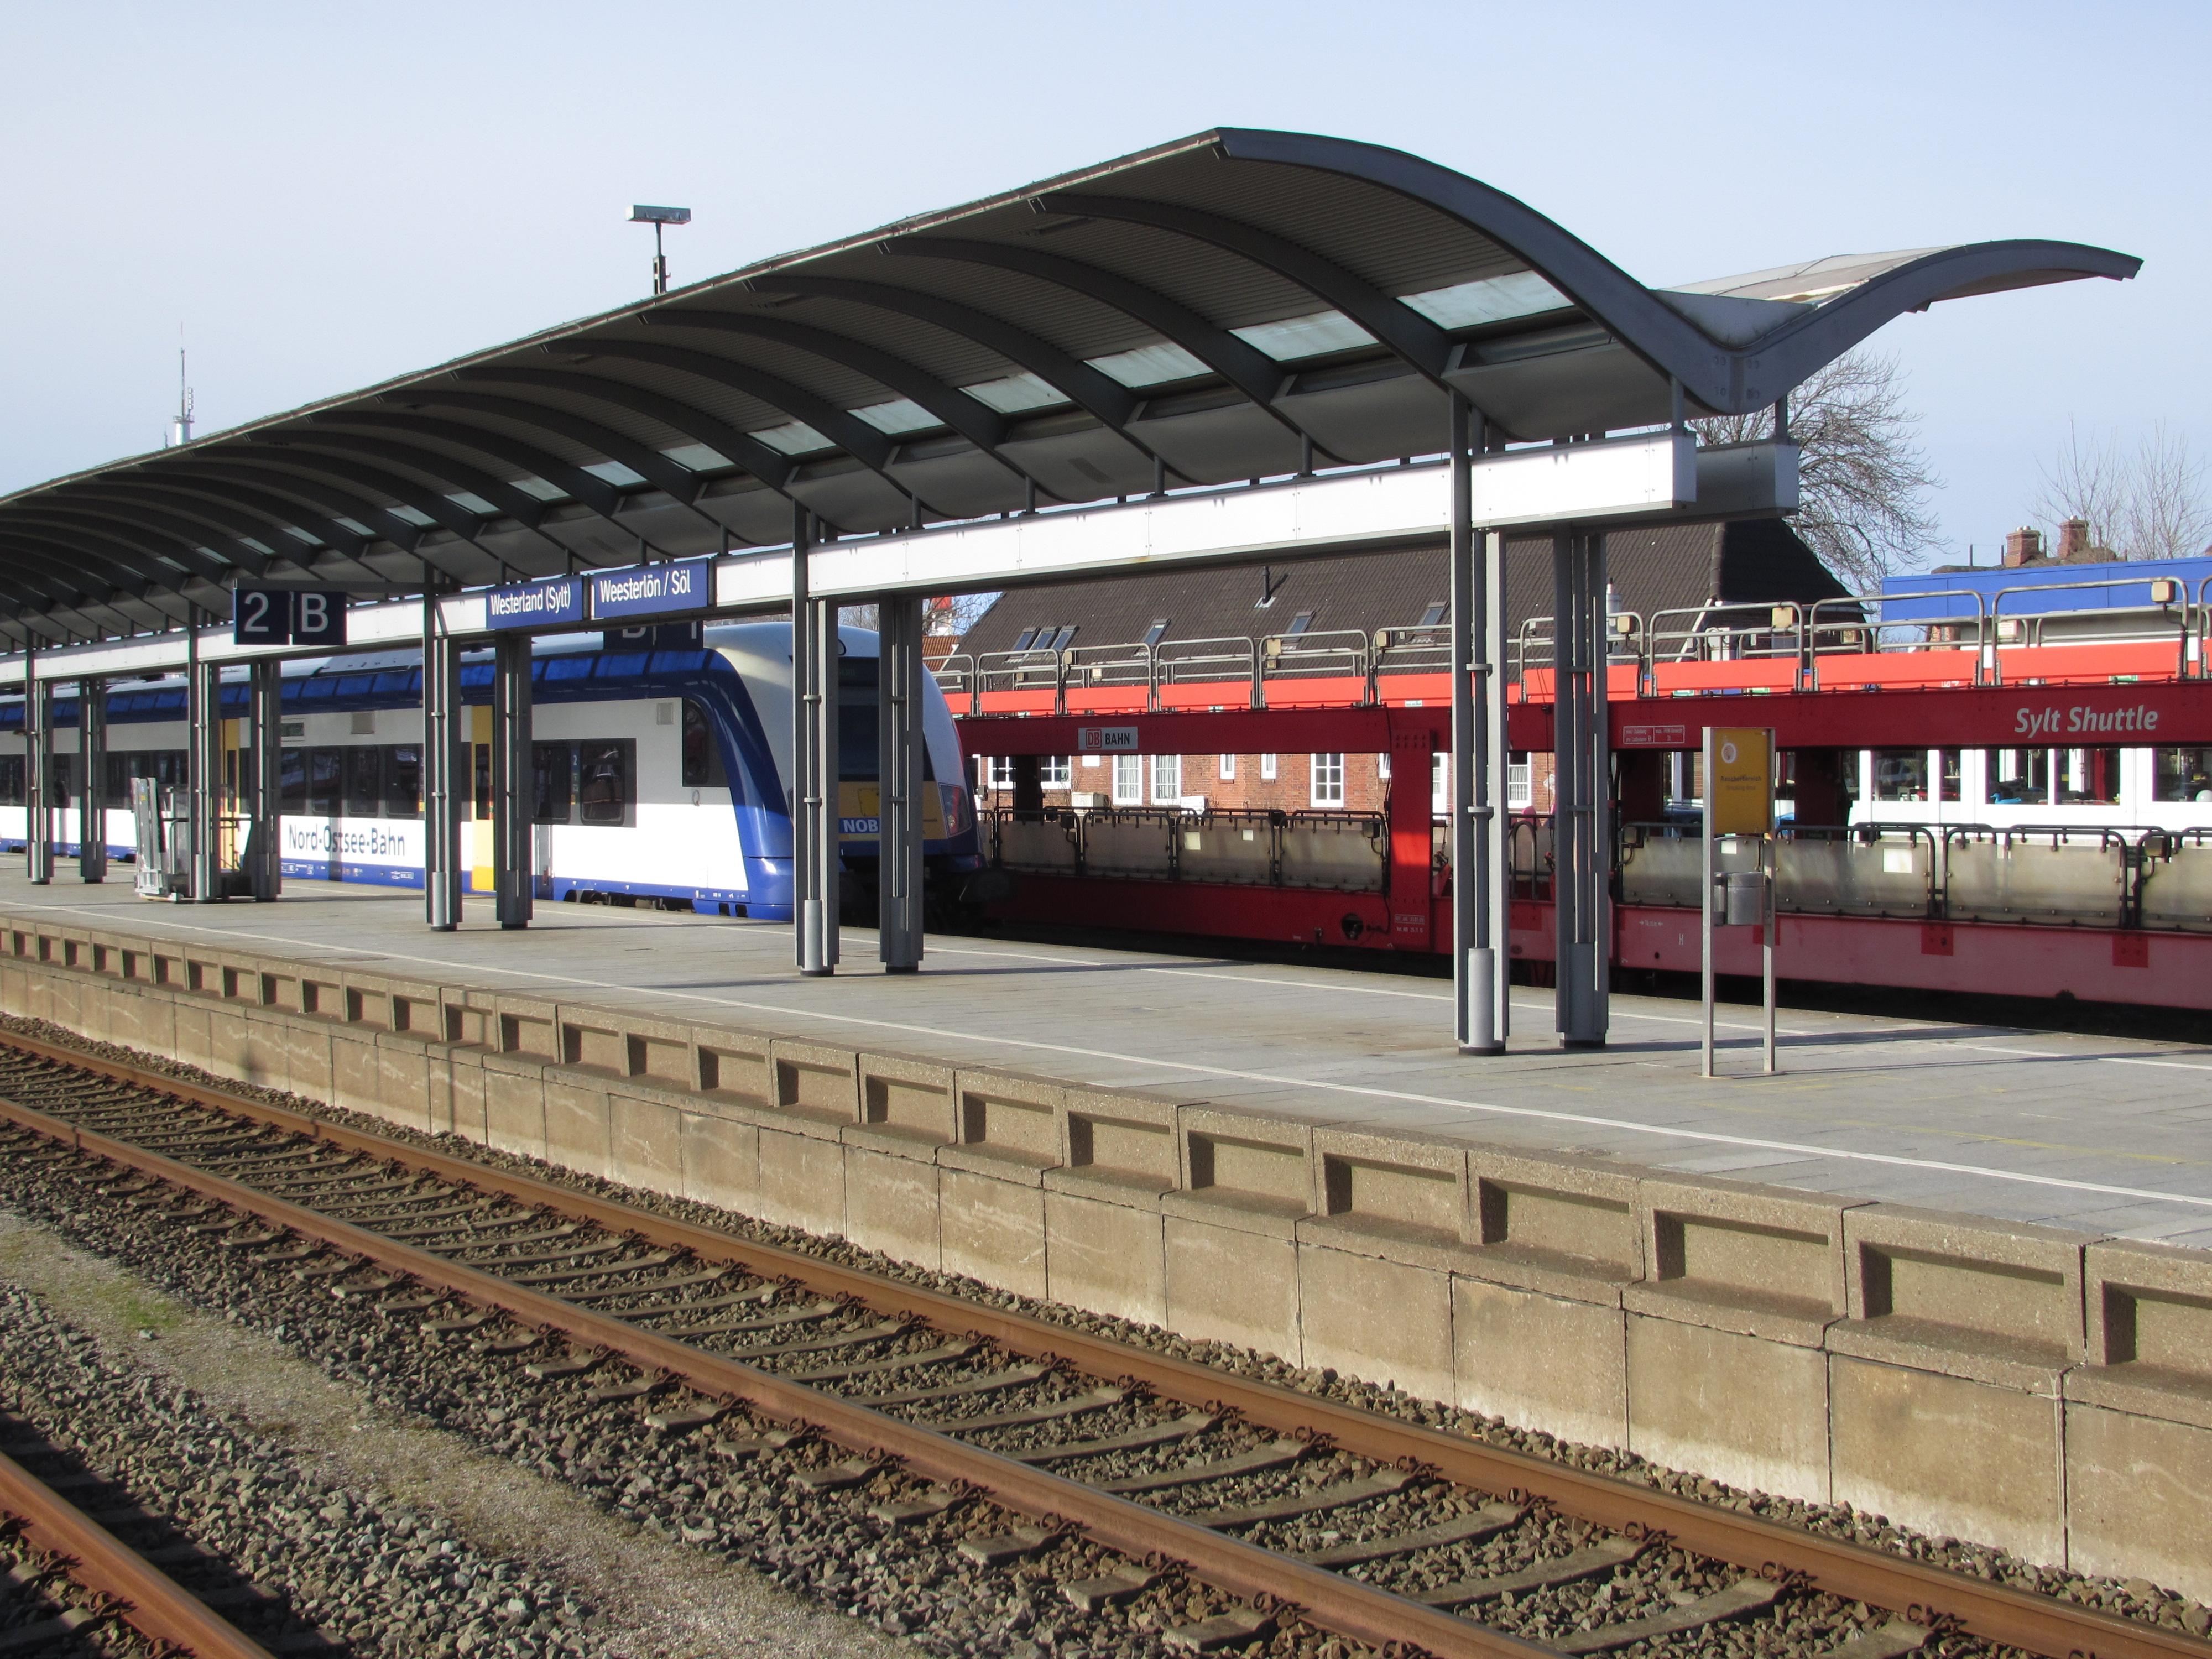 Charming File:20150322 Xl 3509 Sylt Westerland Bahnhof Zug Der Nord